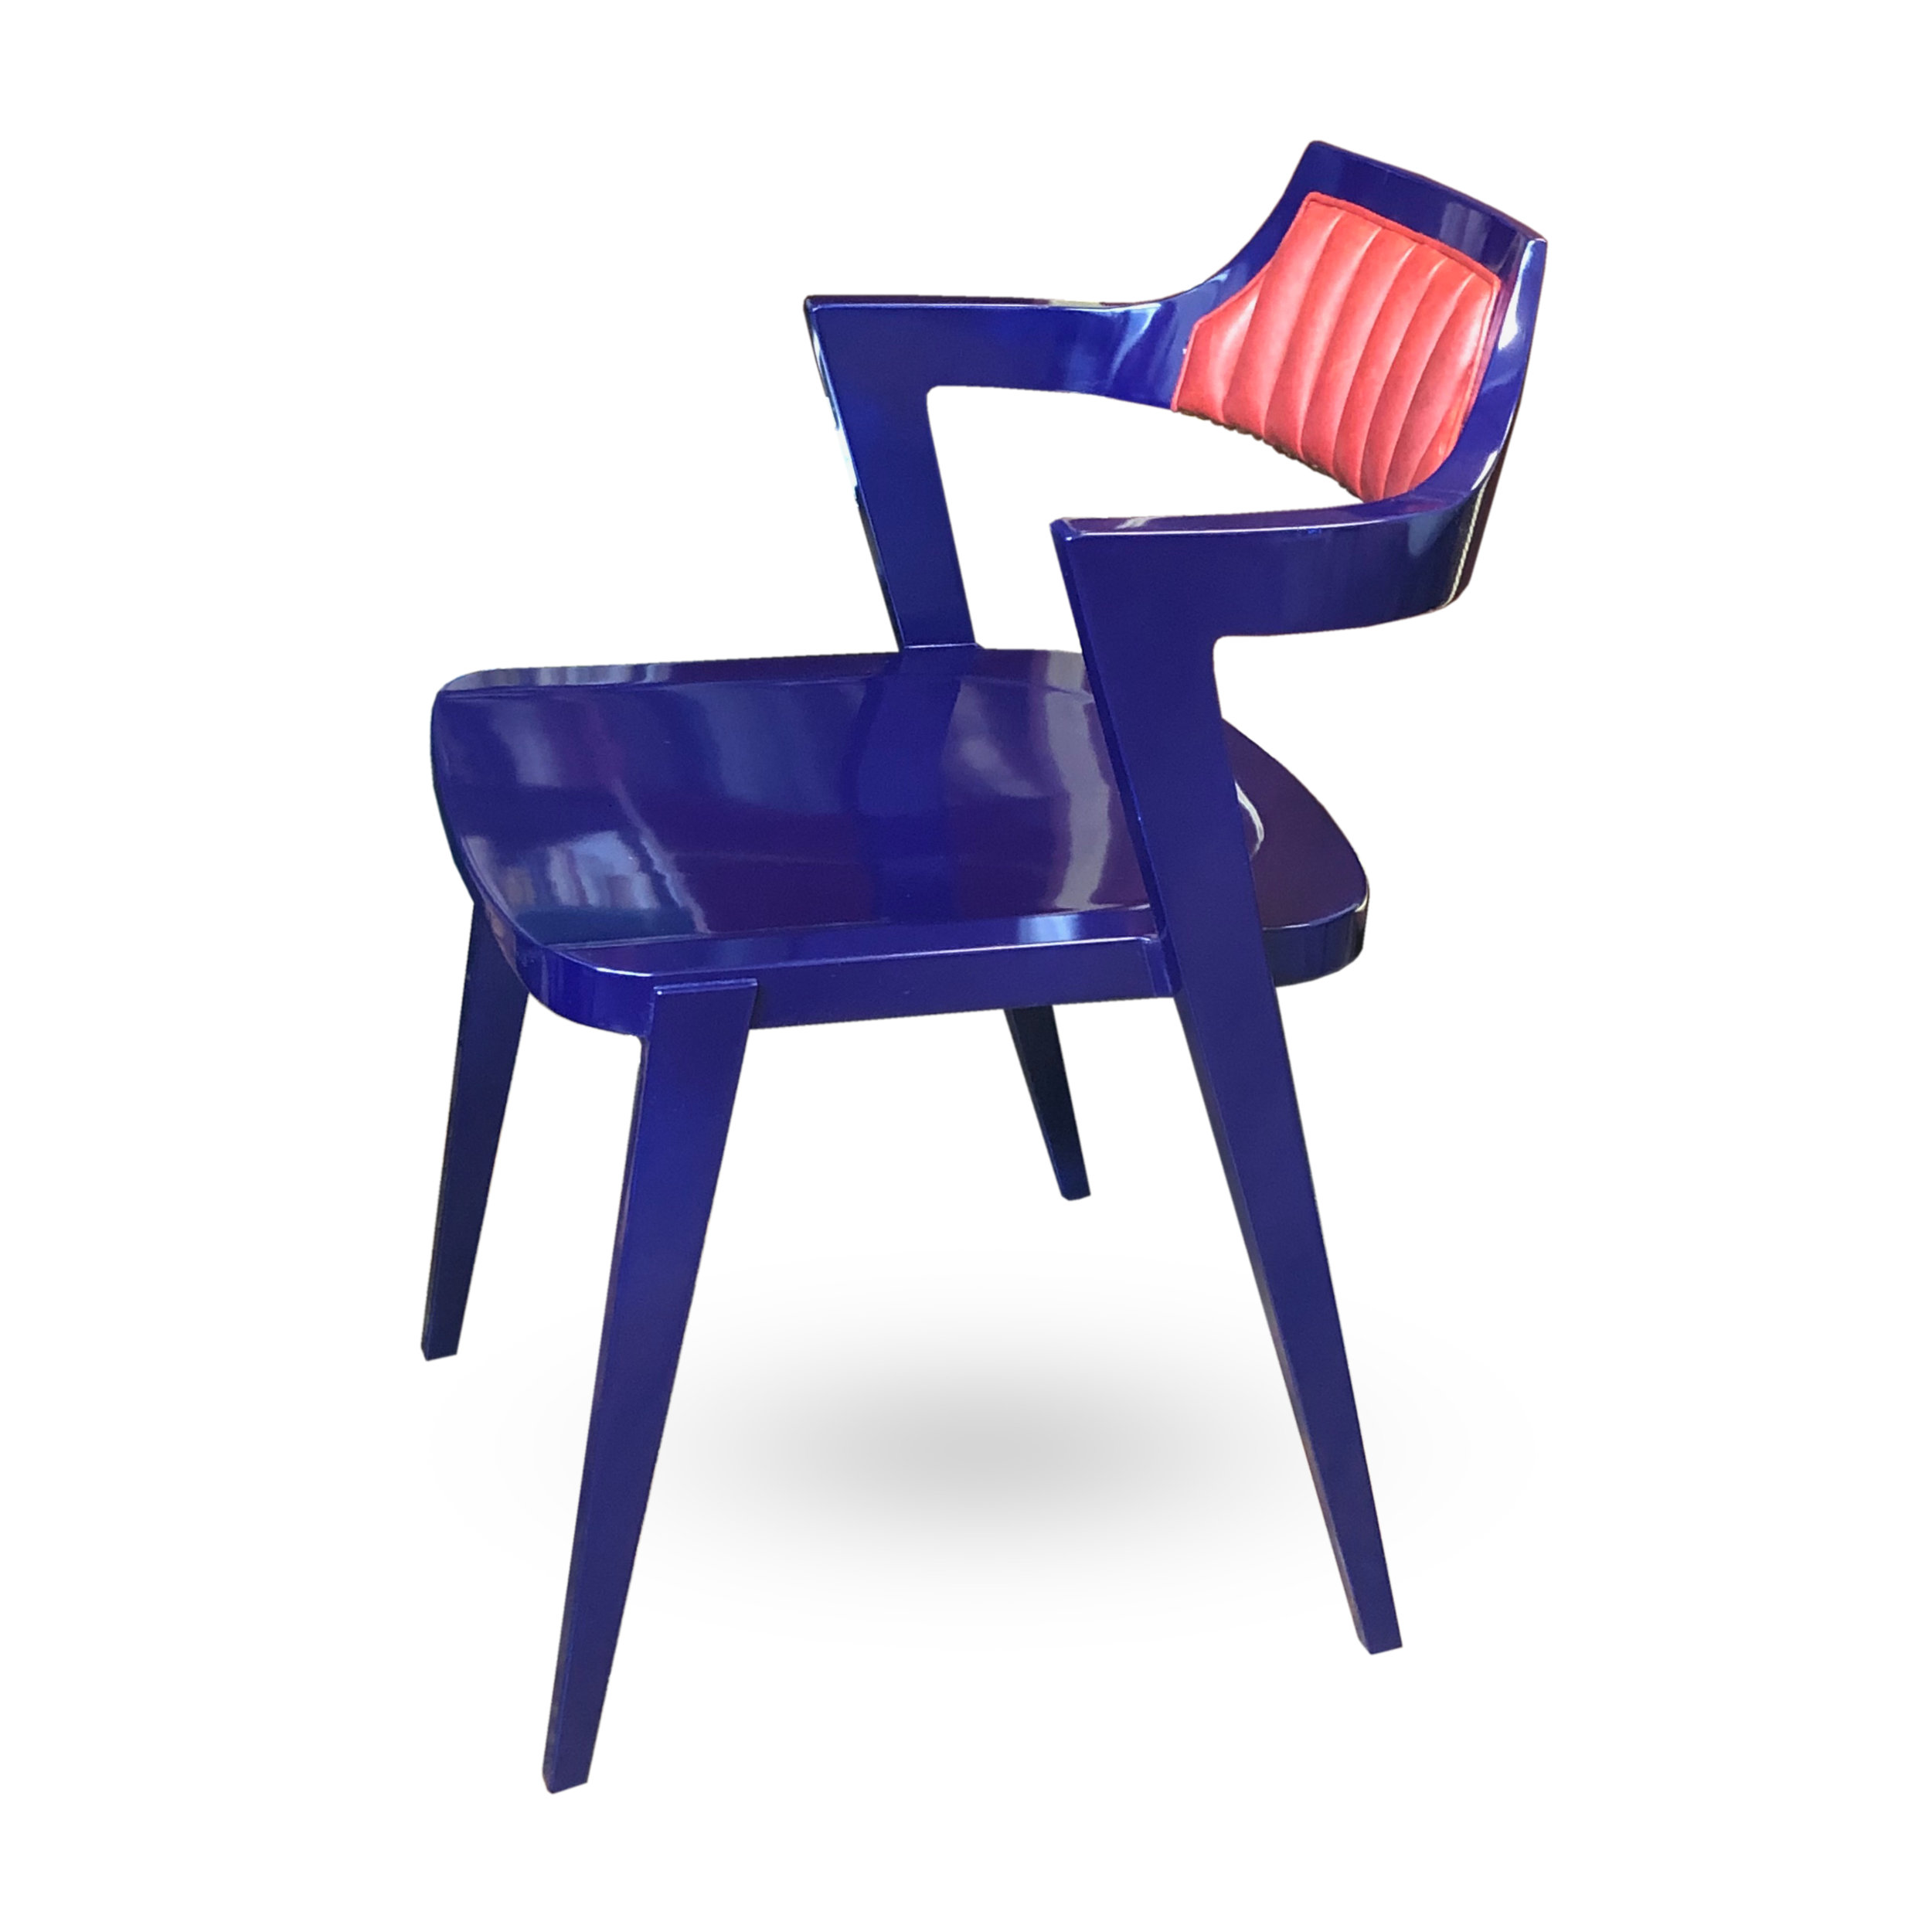 R813-ink-blue-stalking-chair-leather-upholstery-nailhead-trim.jpg